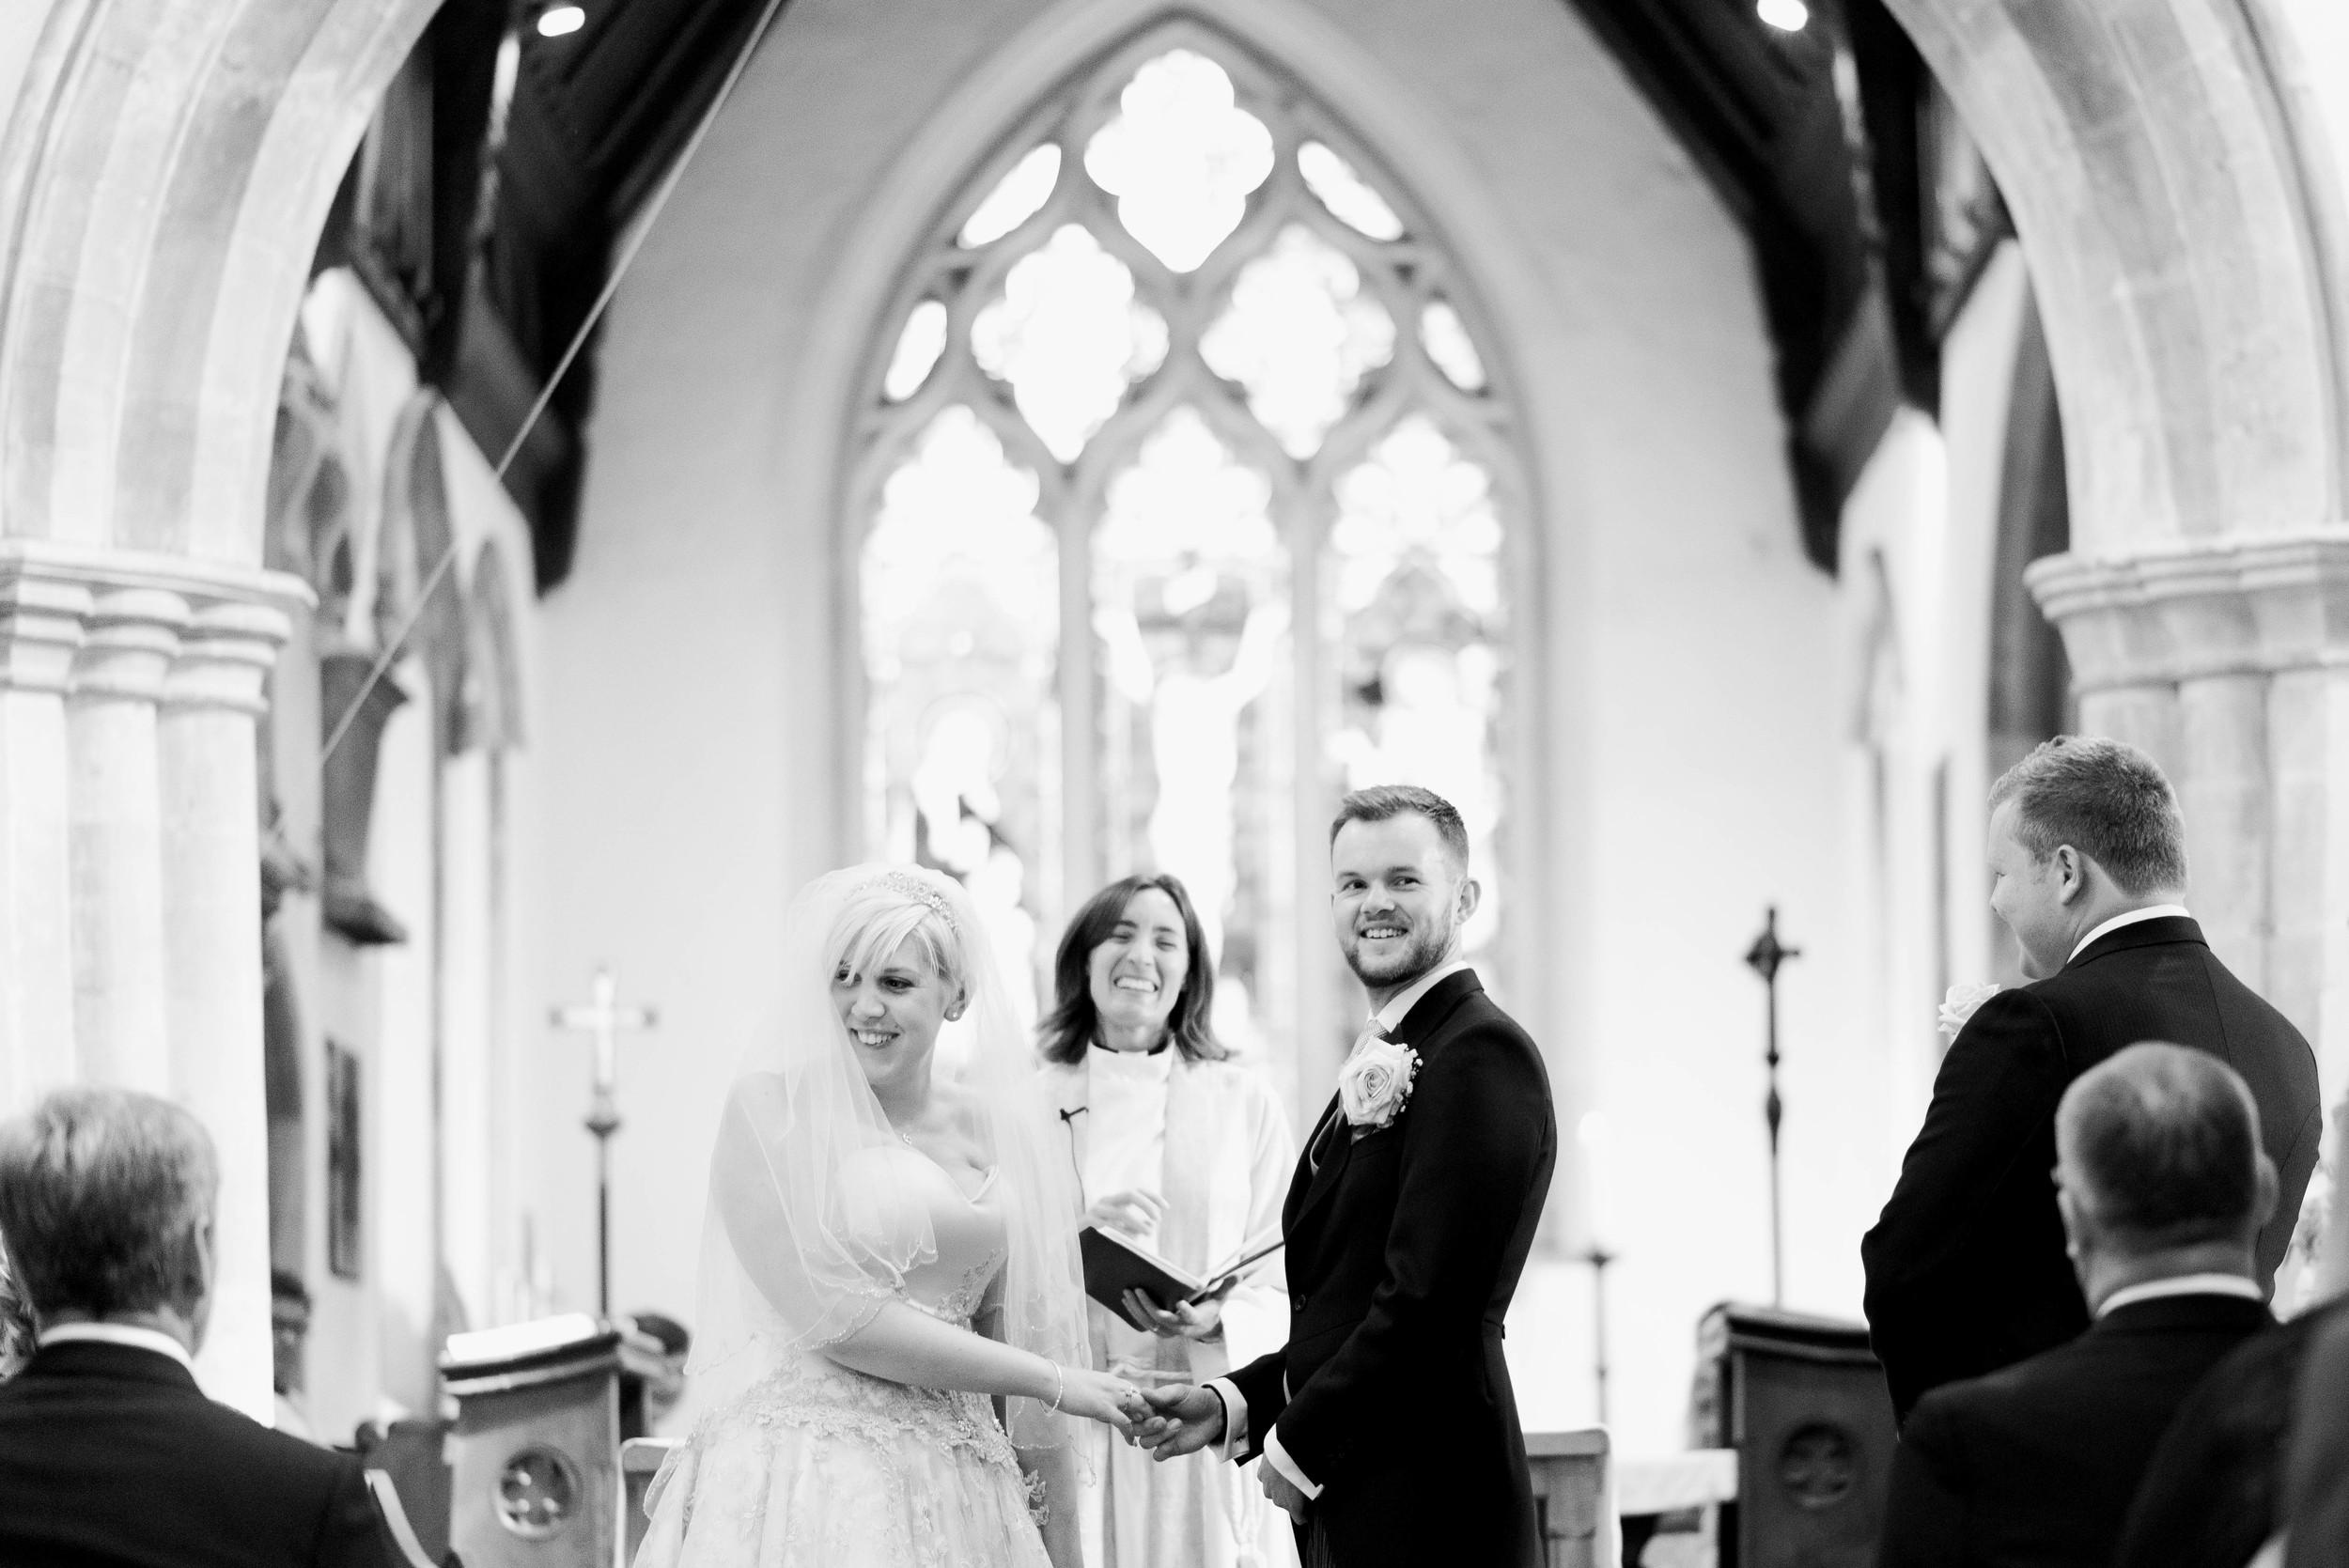 1 Bride Groom Church Wedding Photography.jpg